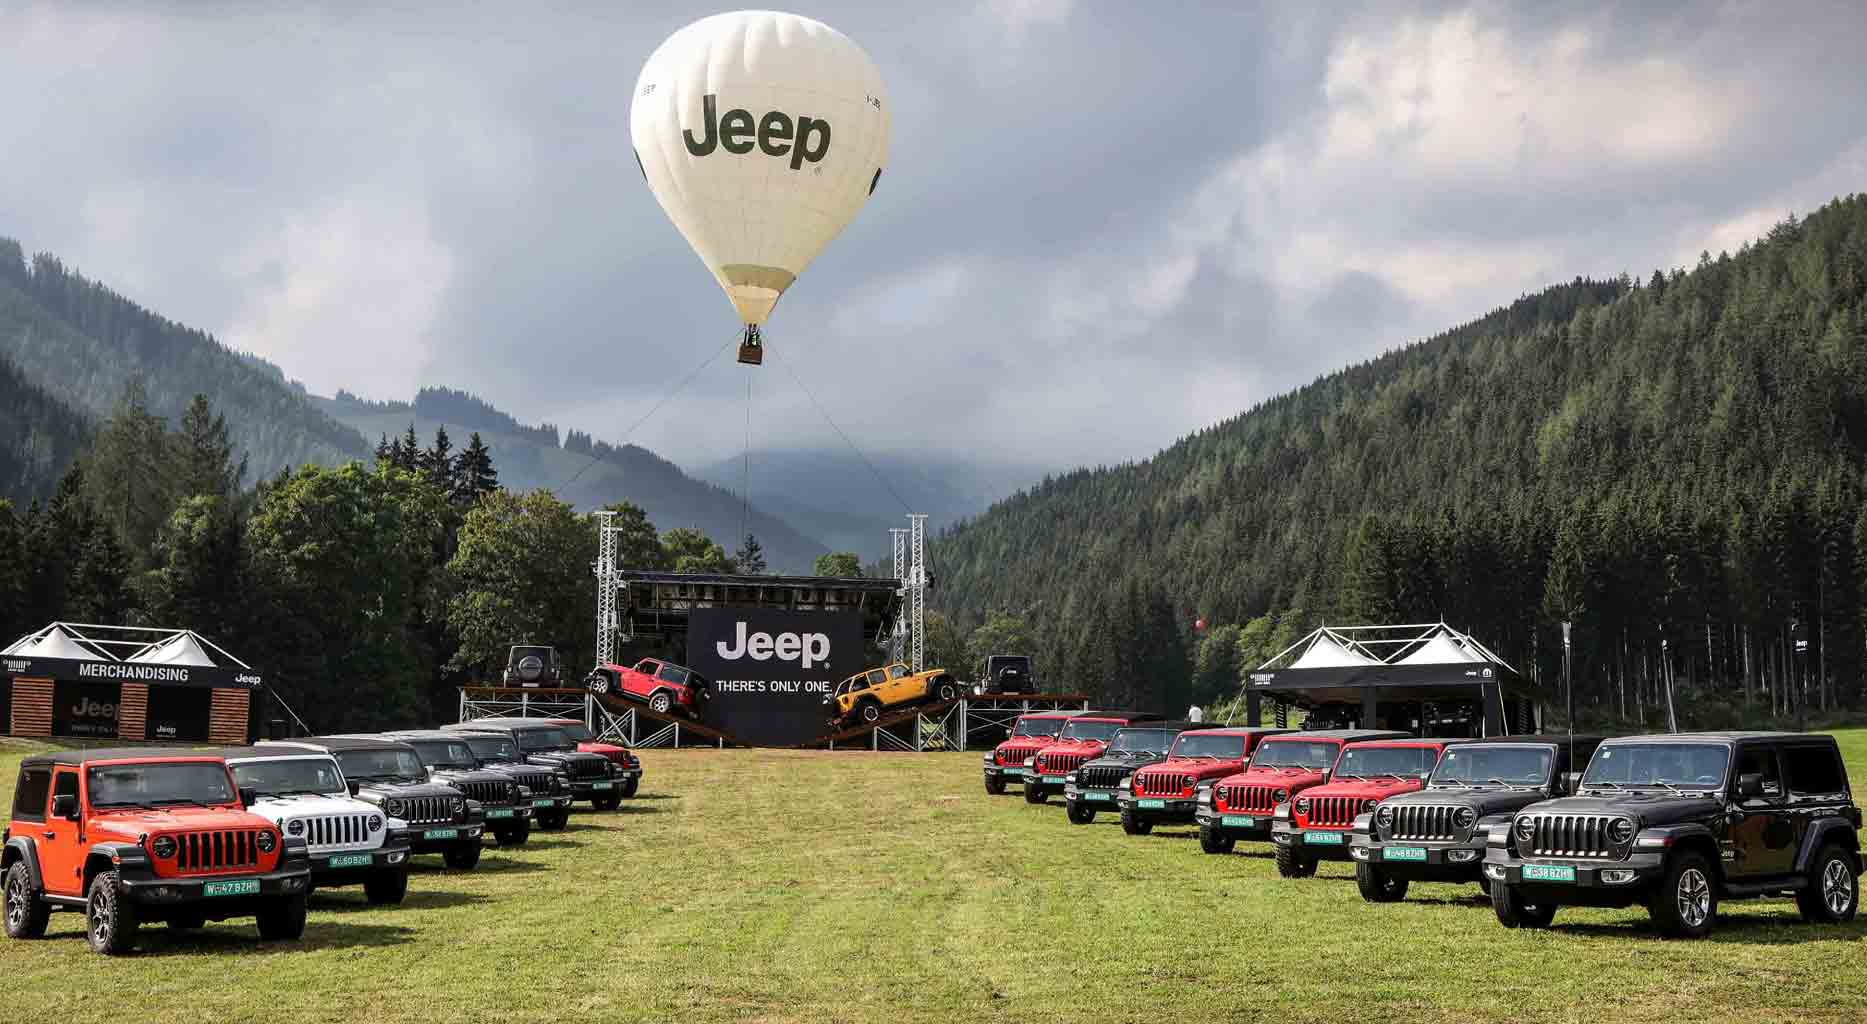 02-Camp-Jeep